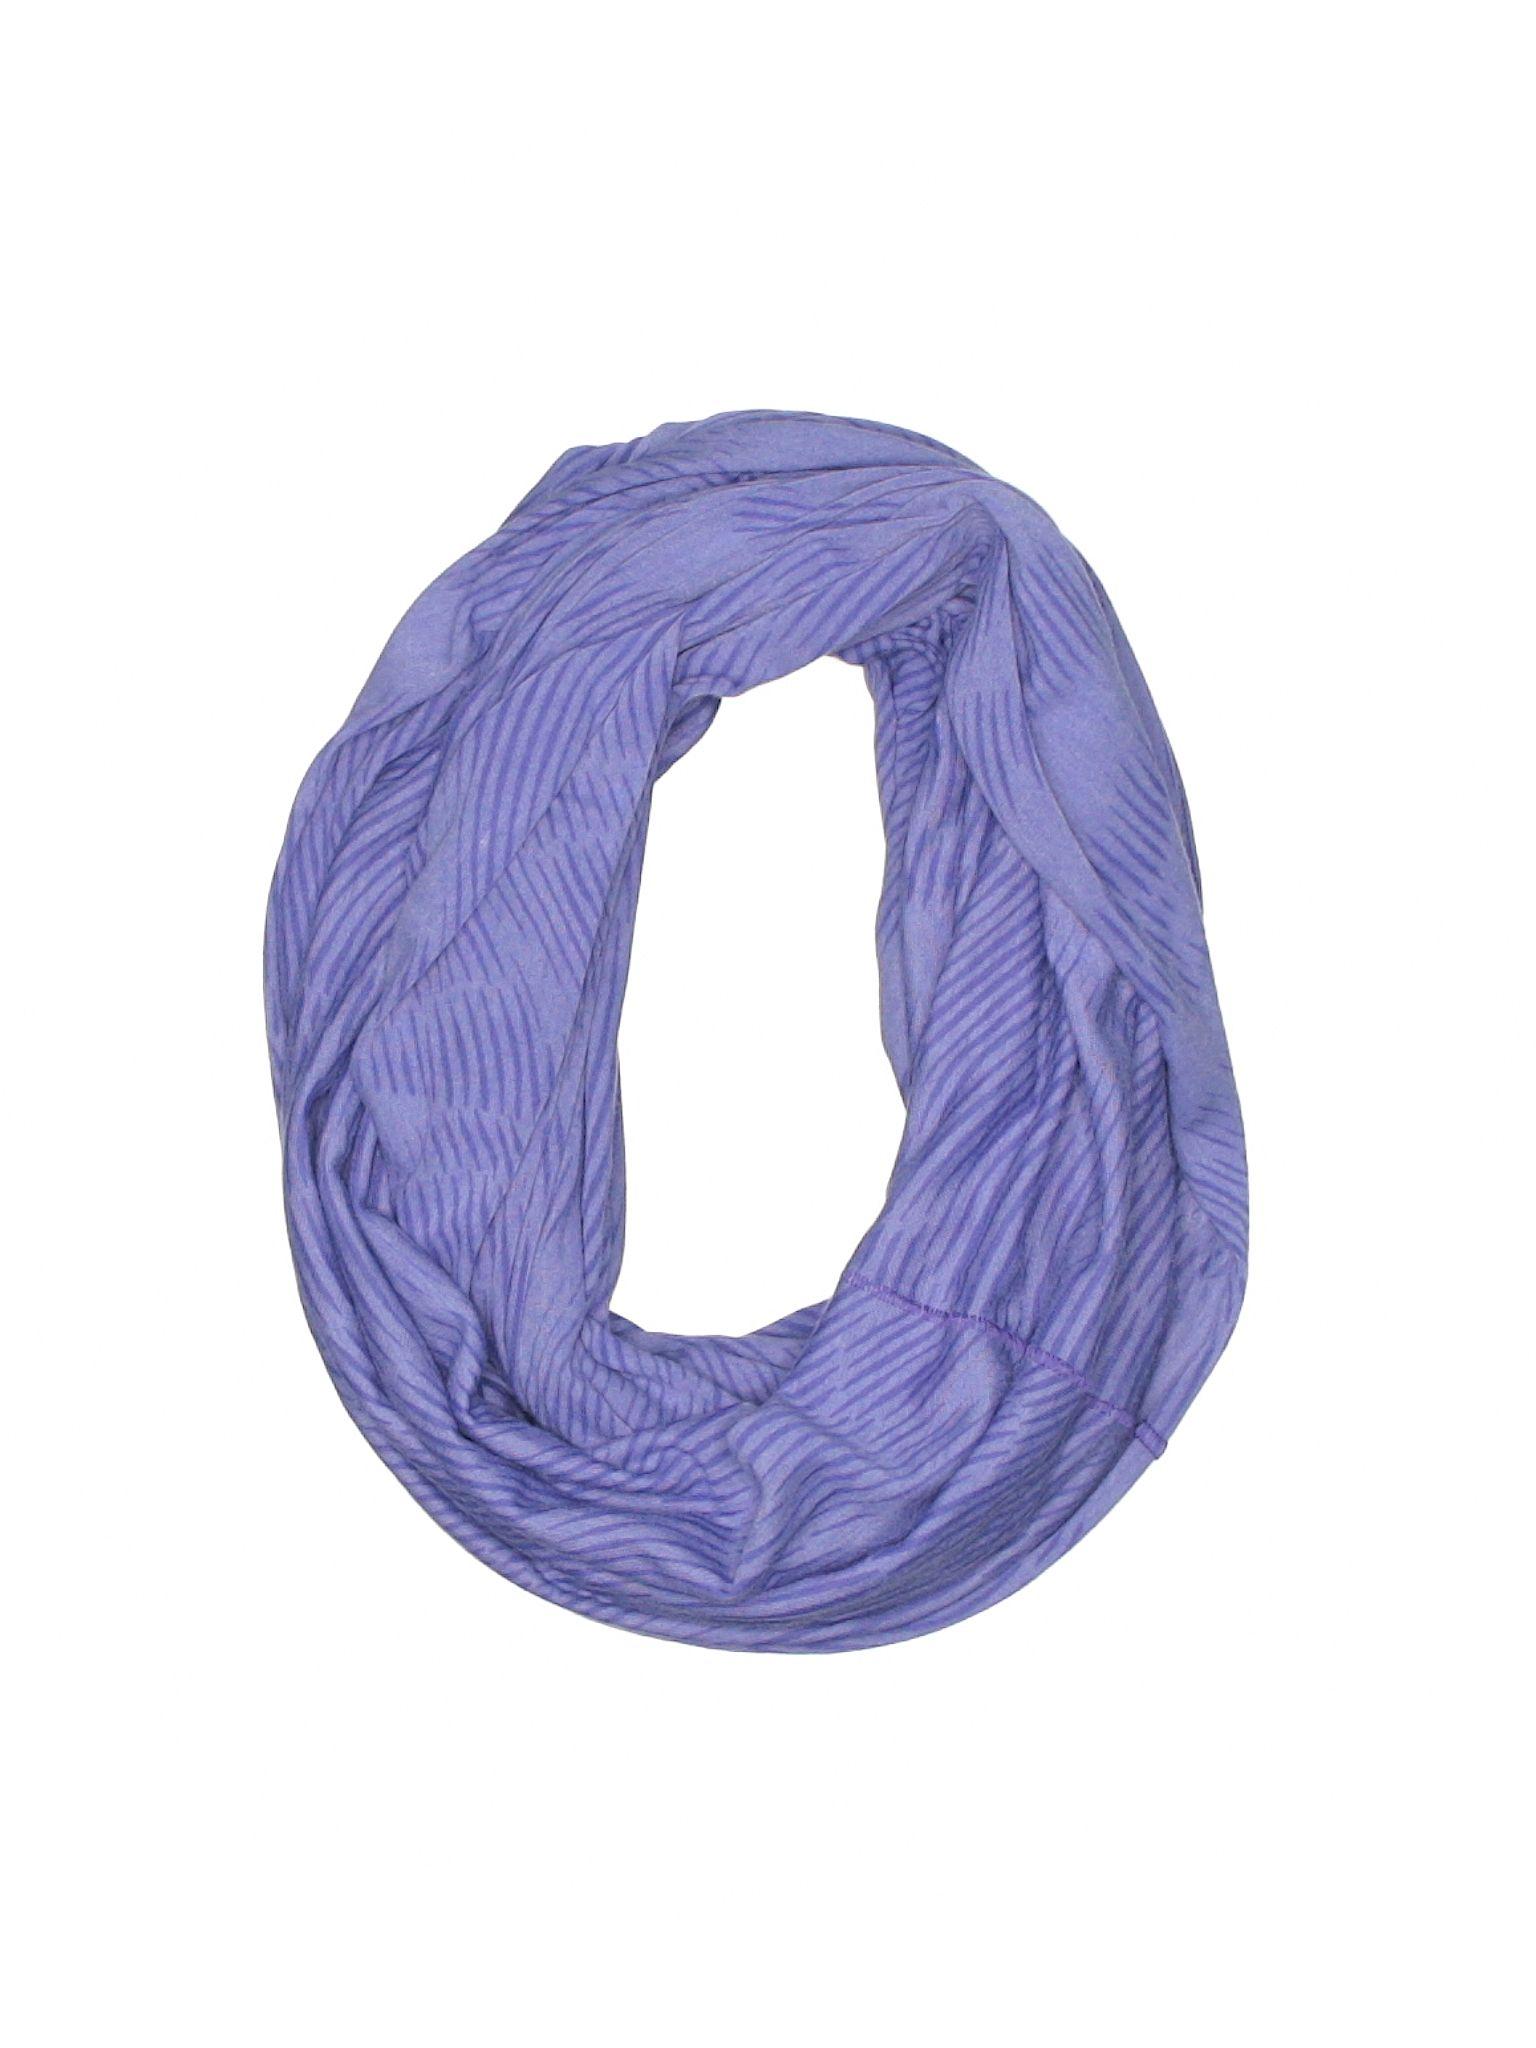 Nike Scarf  Purple Women s Accessories - 23722933 7e7bf0b38